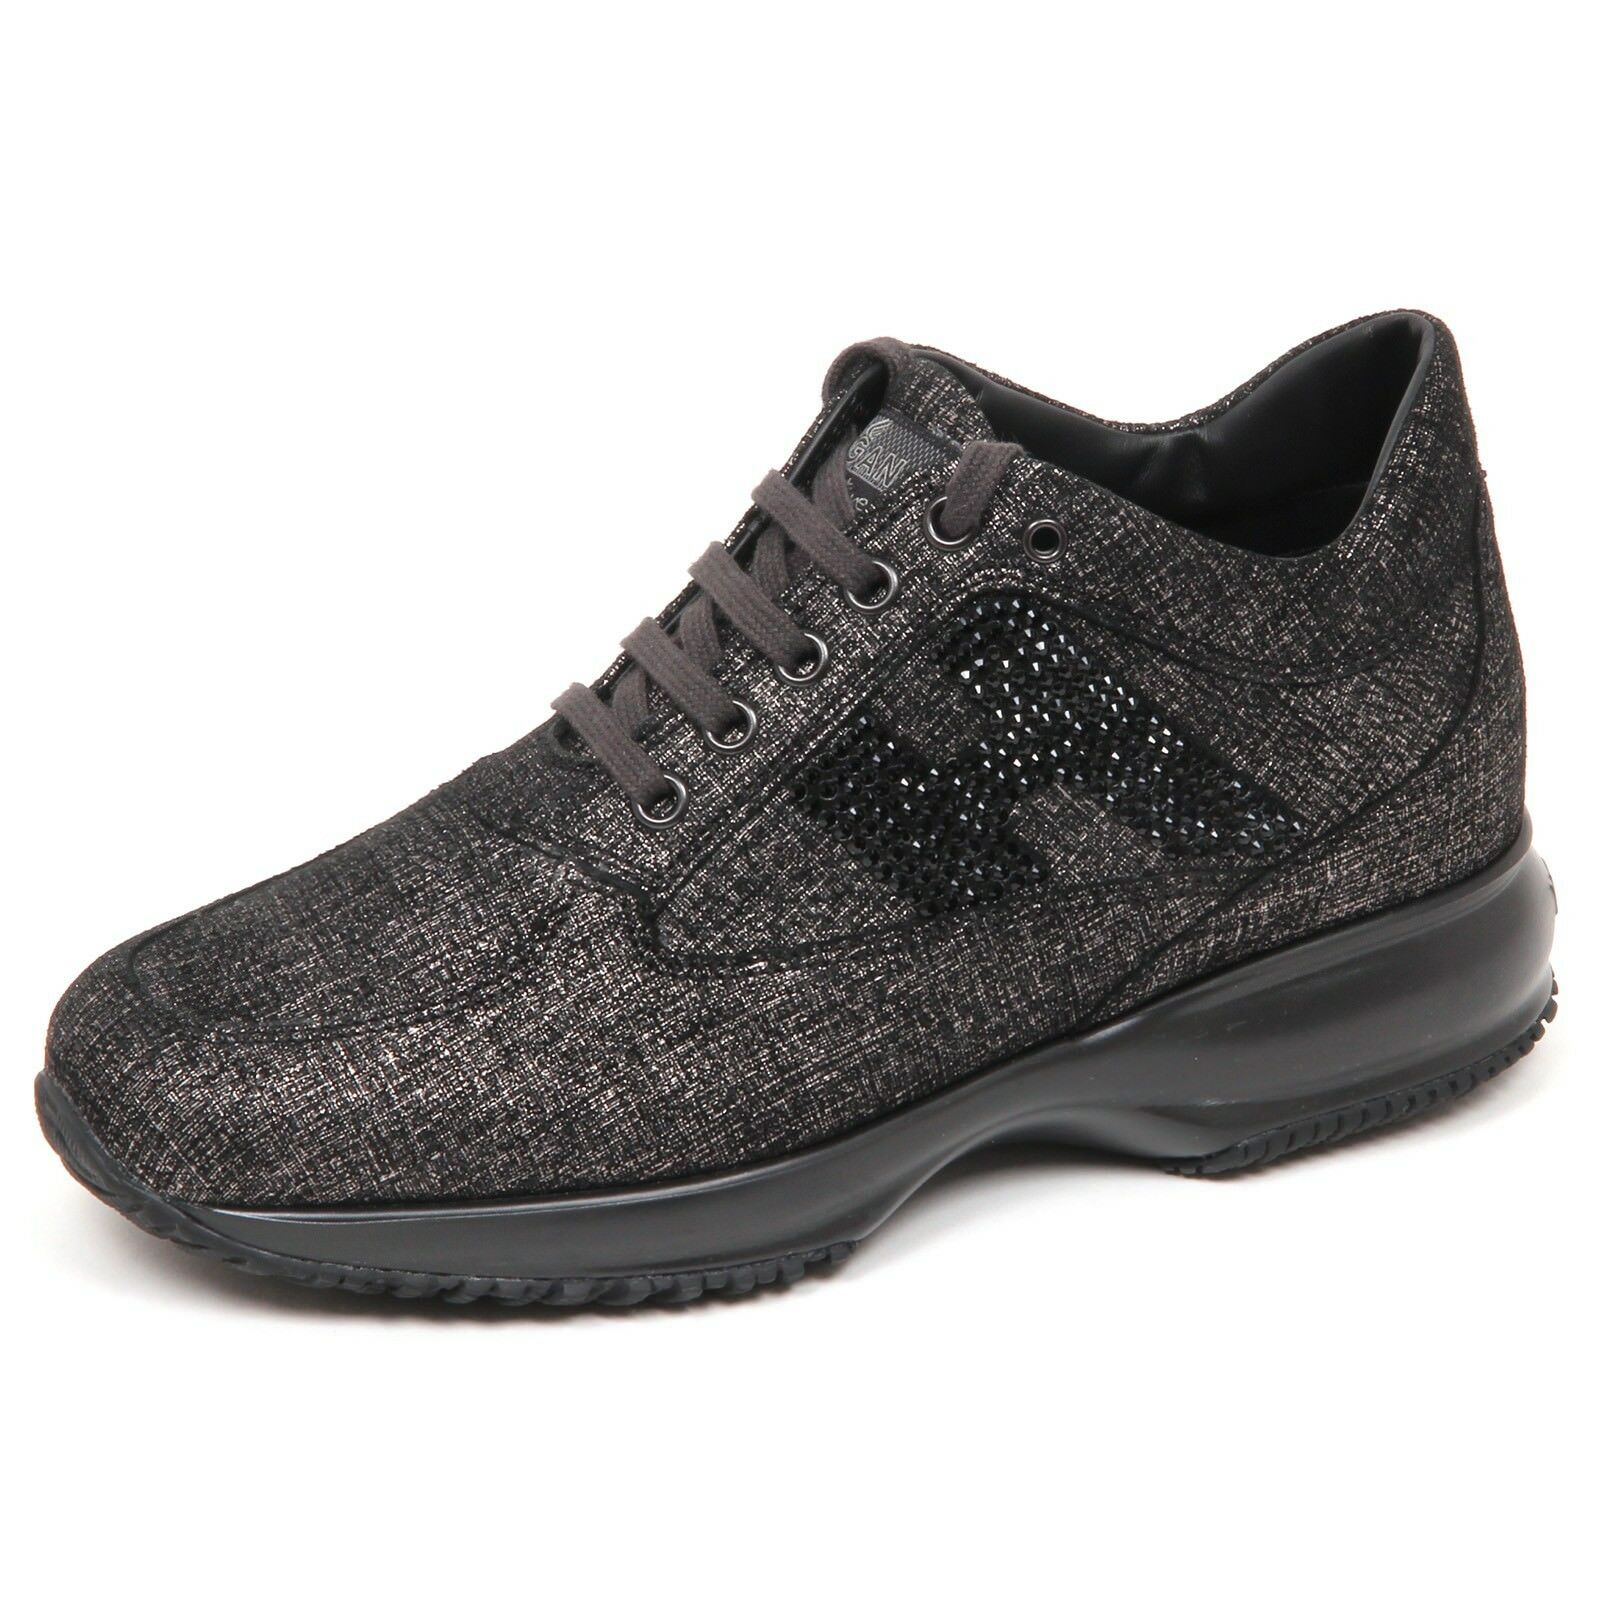 E4302 sneaker mujer  nero/platino HOGAN INTERACTIVE  Zapatos  H strass  mujer Zapatos  Mujer 4e7dd2